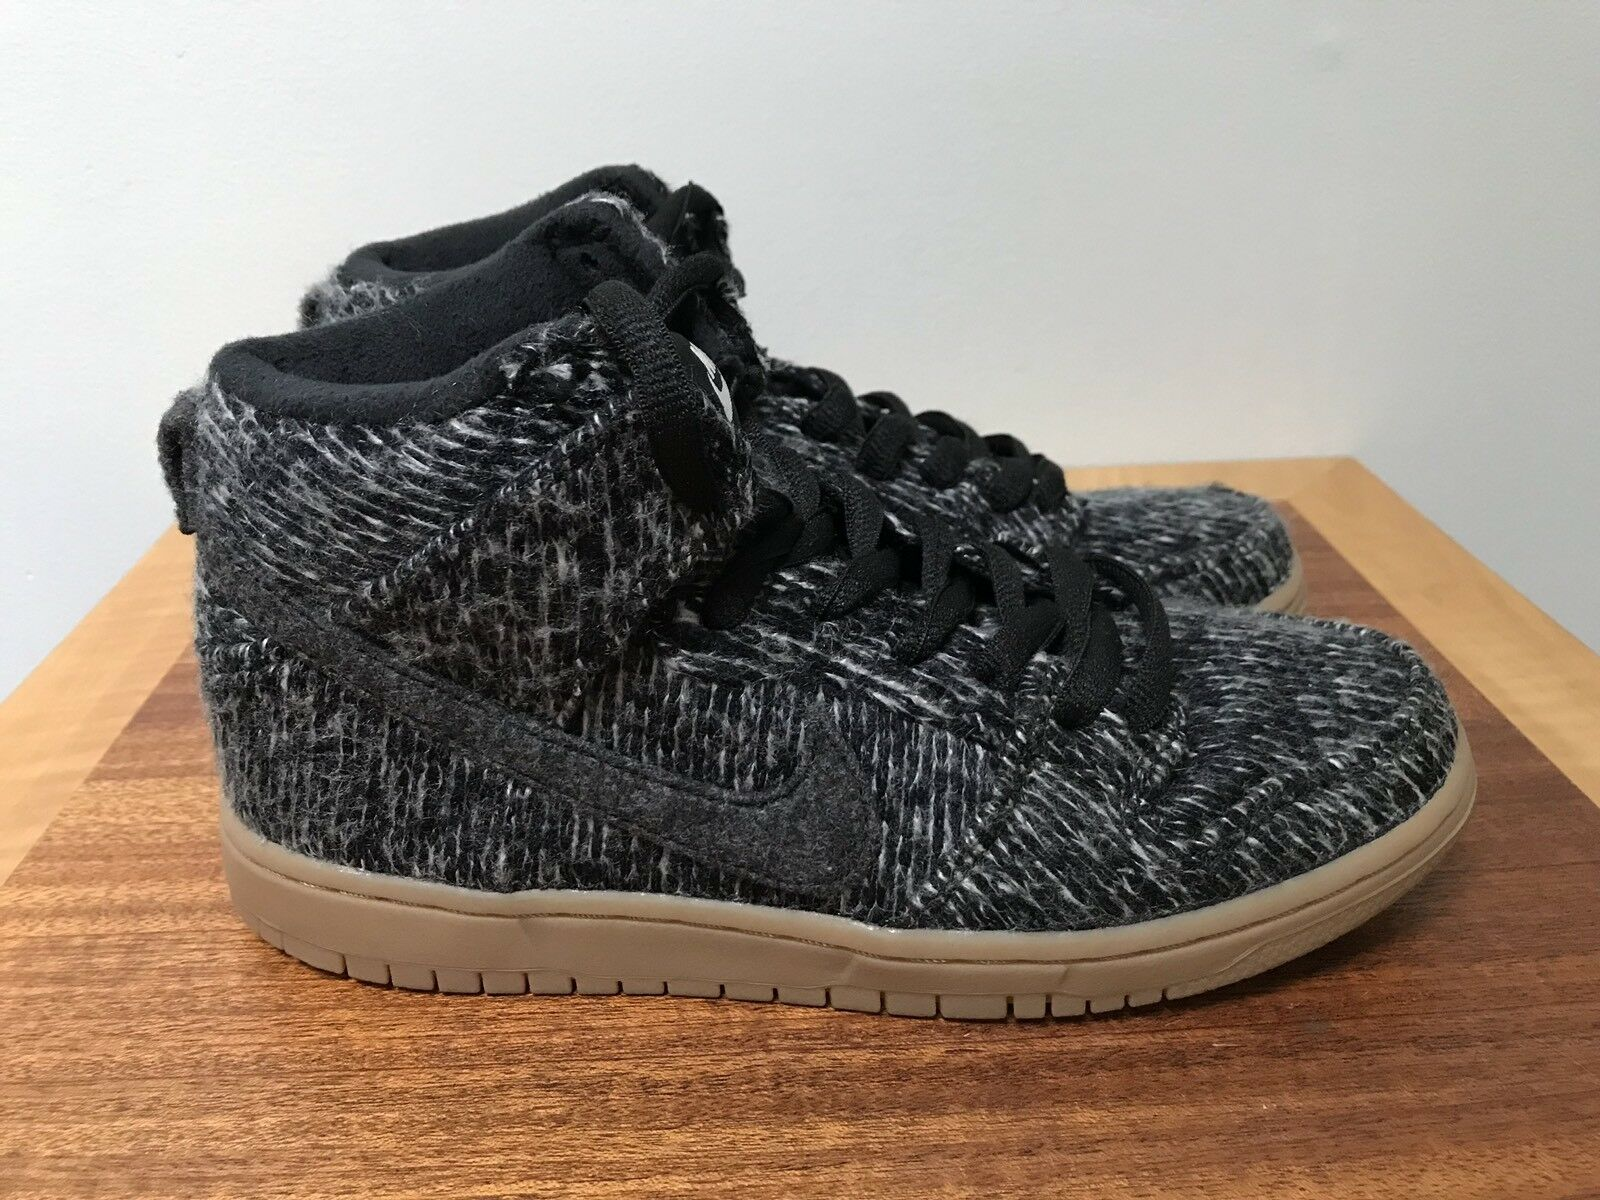 NEW Nike SB Wool Dunk Warmth Pack BLACK GUM GUM GUM Oreo Hi Tops shoes Men's 6 07b191